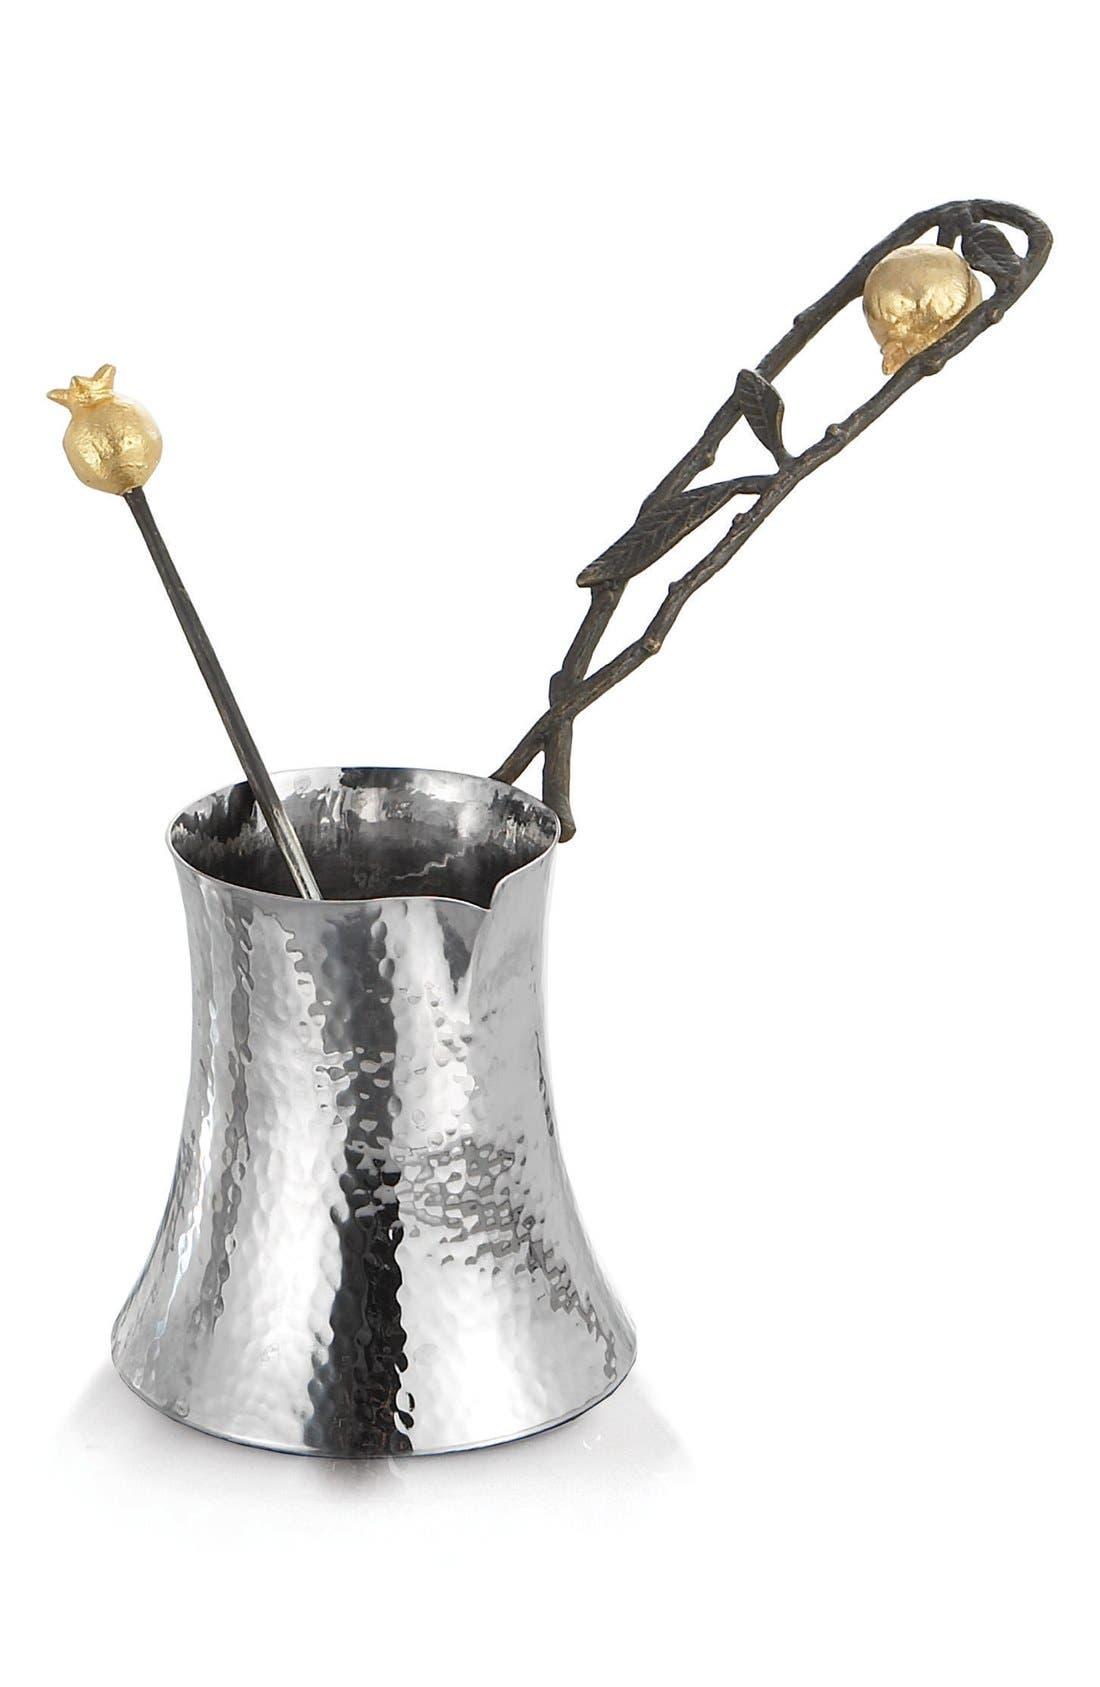 Michael Aram 'Pomegranate' Coffee Pot with Spoon